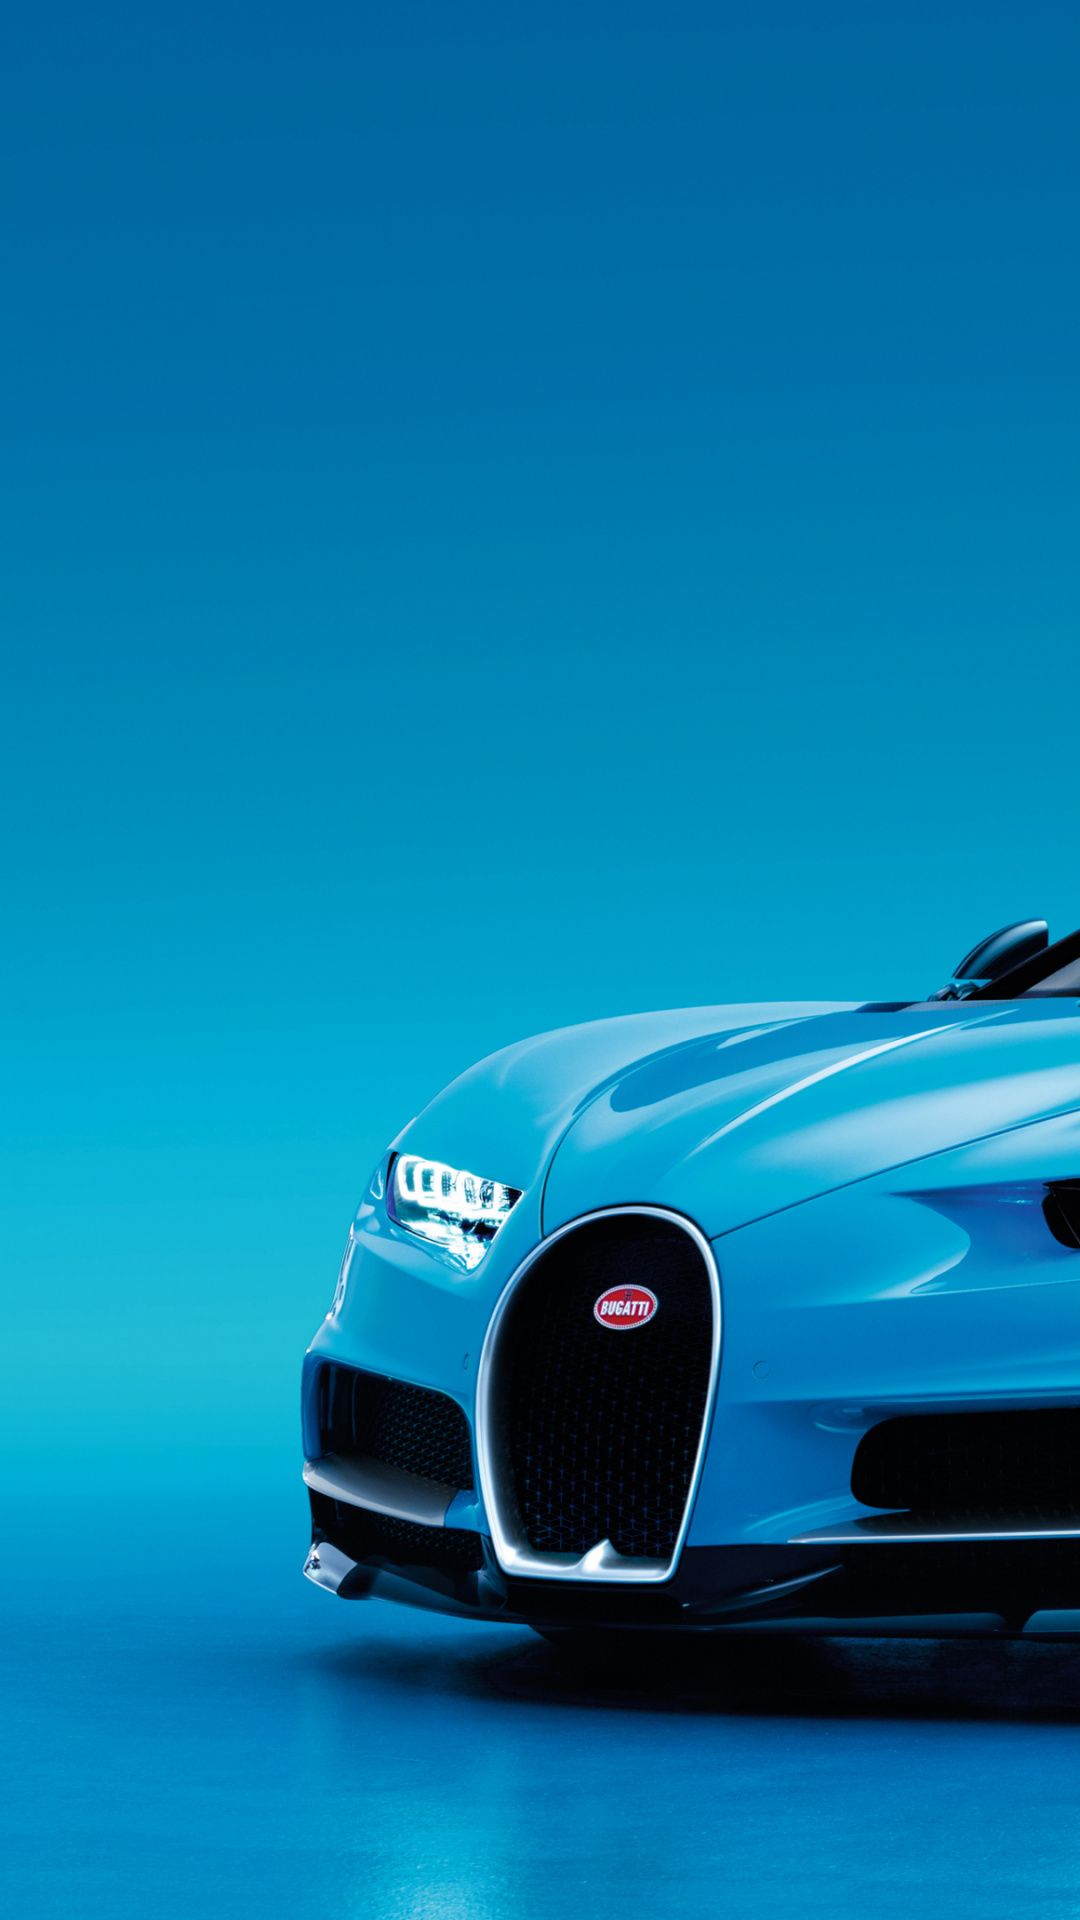 Bugatti Veyron For Sale - duPont REGISTRY